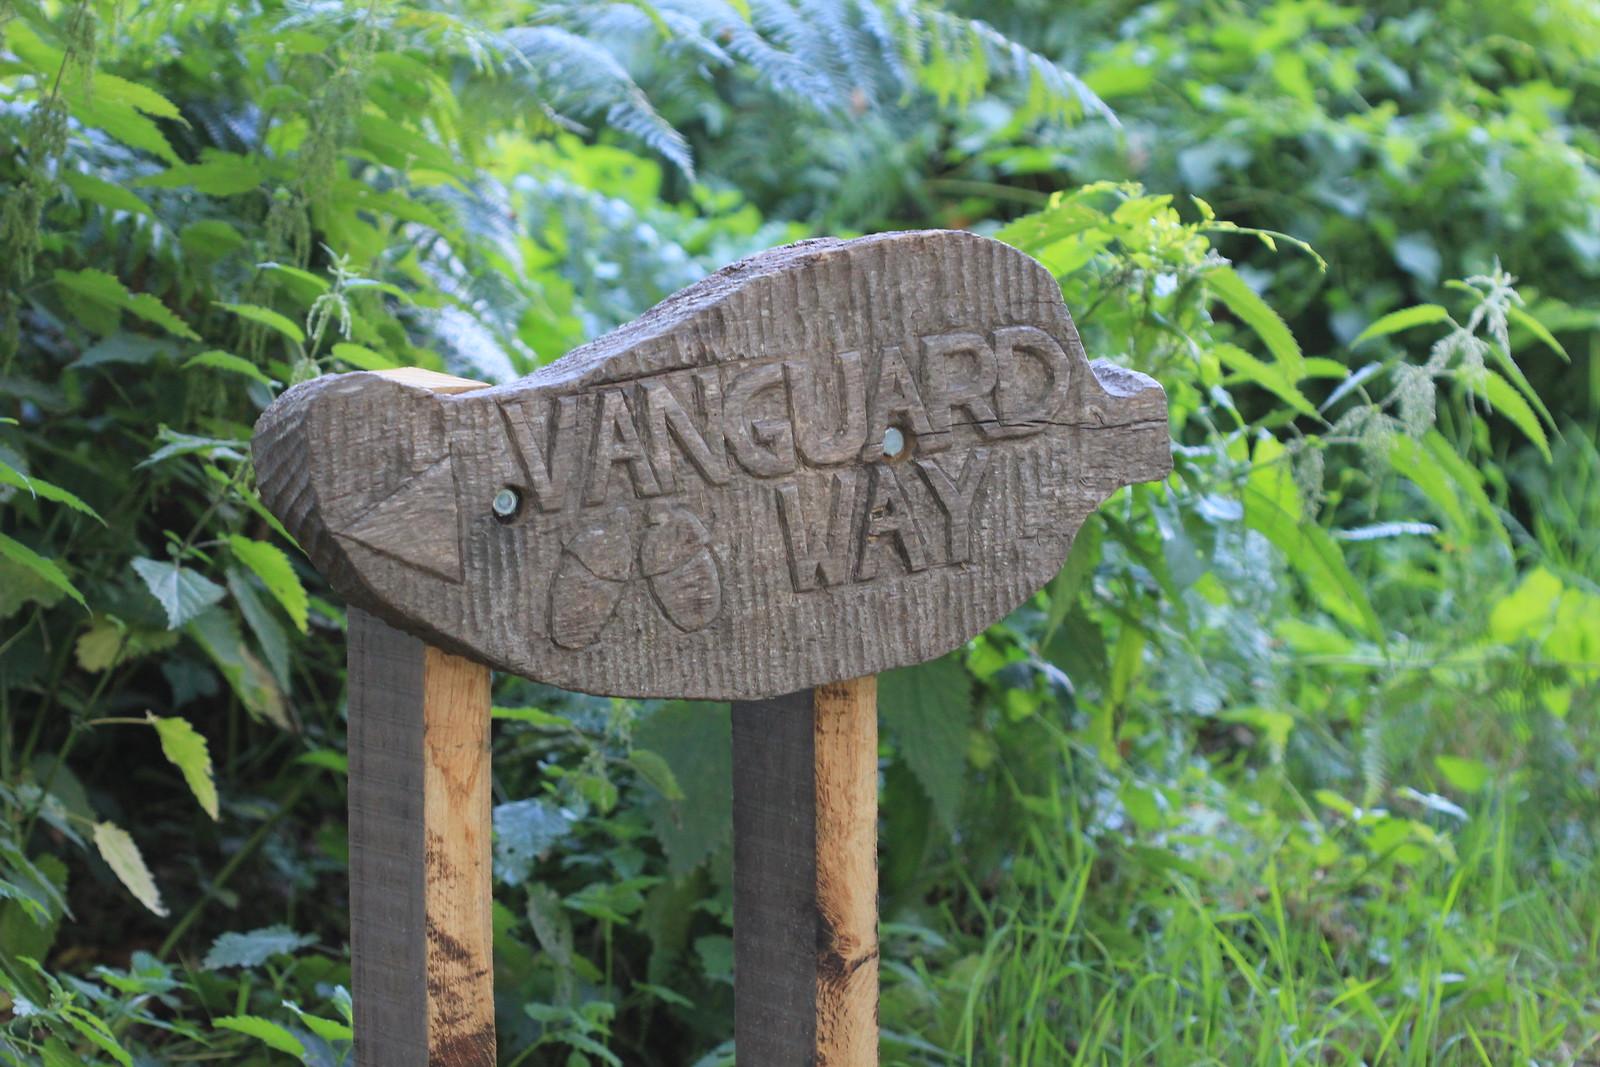 Vanguard Way - Ashdown Forest